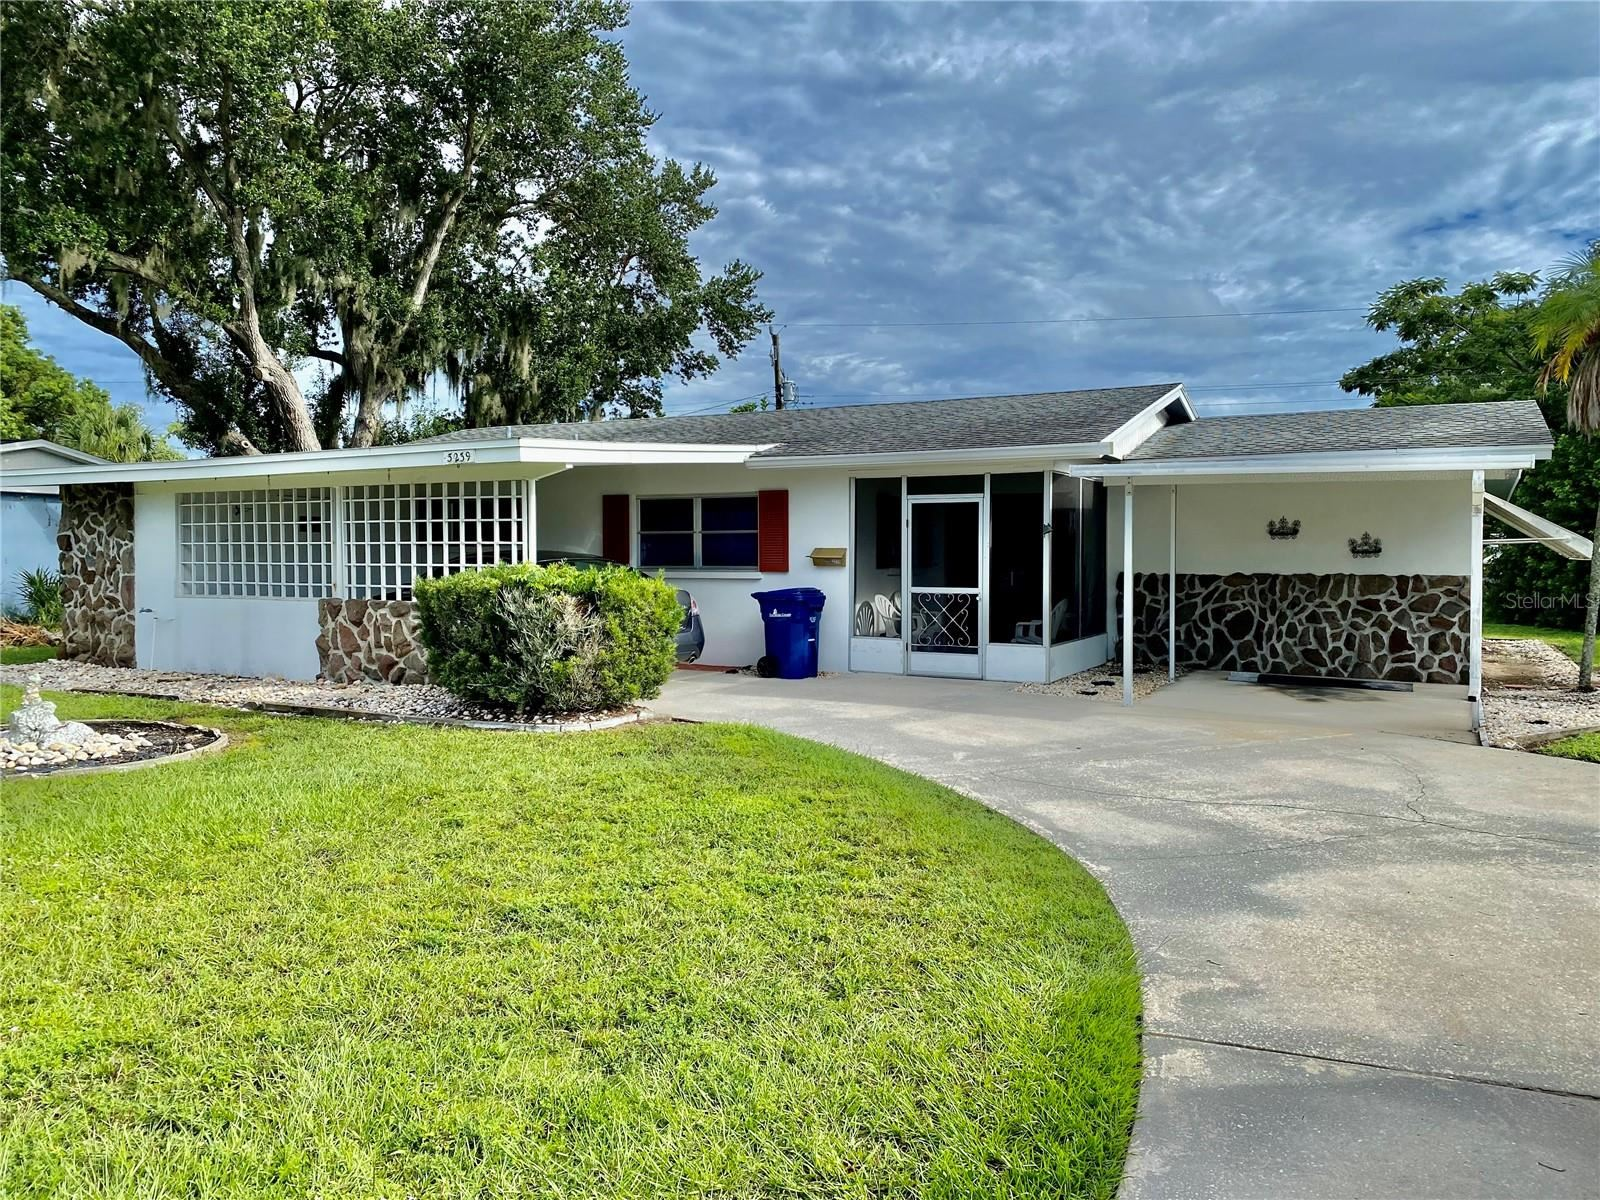 3239 EAGLE STREET, Sarasota, FL 34235 - #: A4505716